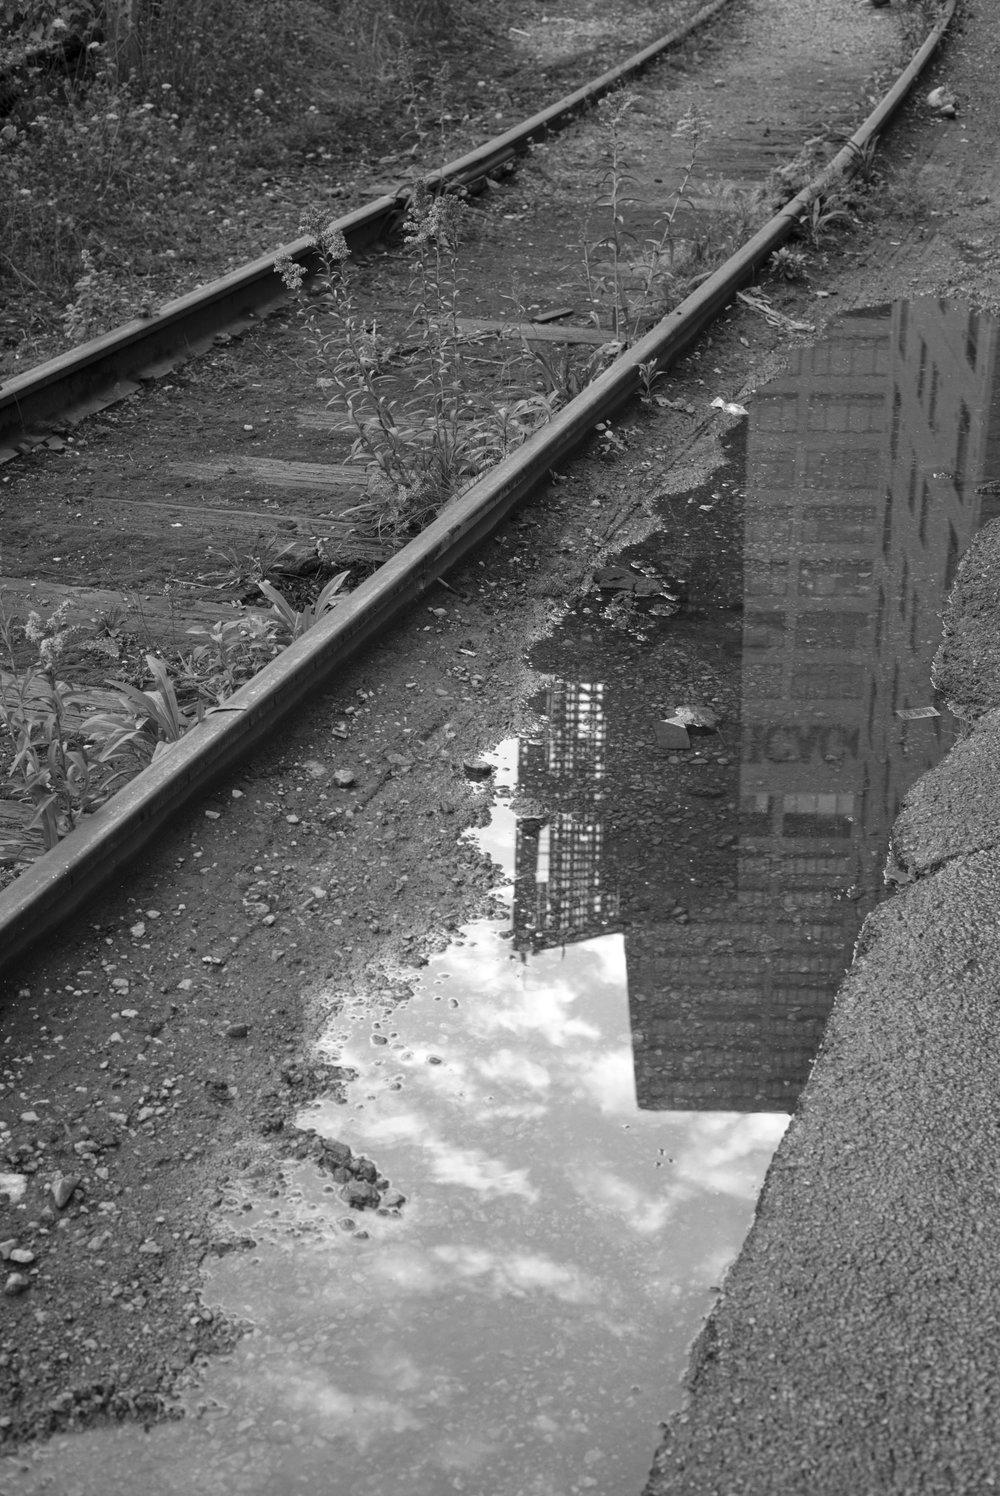 Bridge Up Chicago, USA Leica M (Typ 246) 50mm f/2.0 APO Summicron  © Keith R. Sbiral, 2018